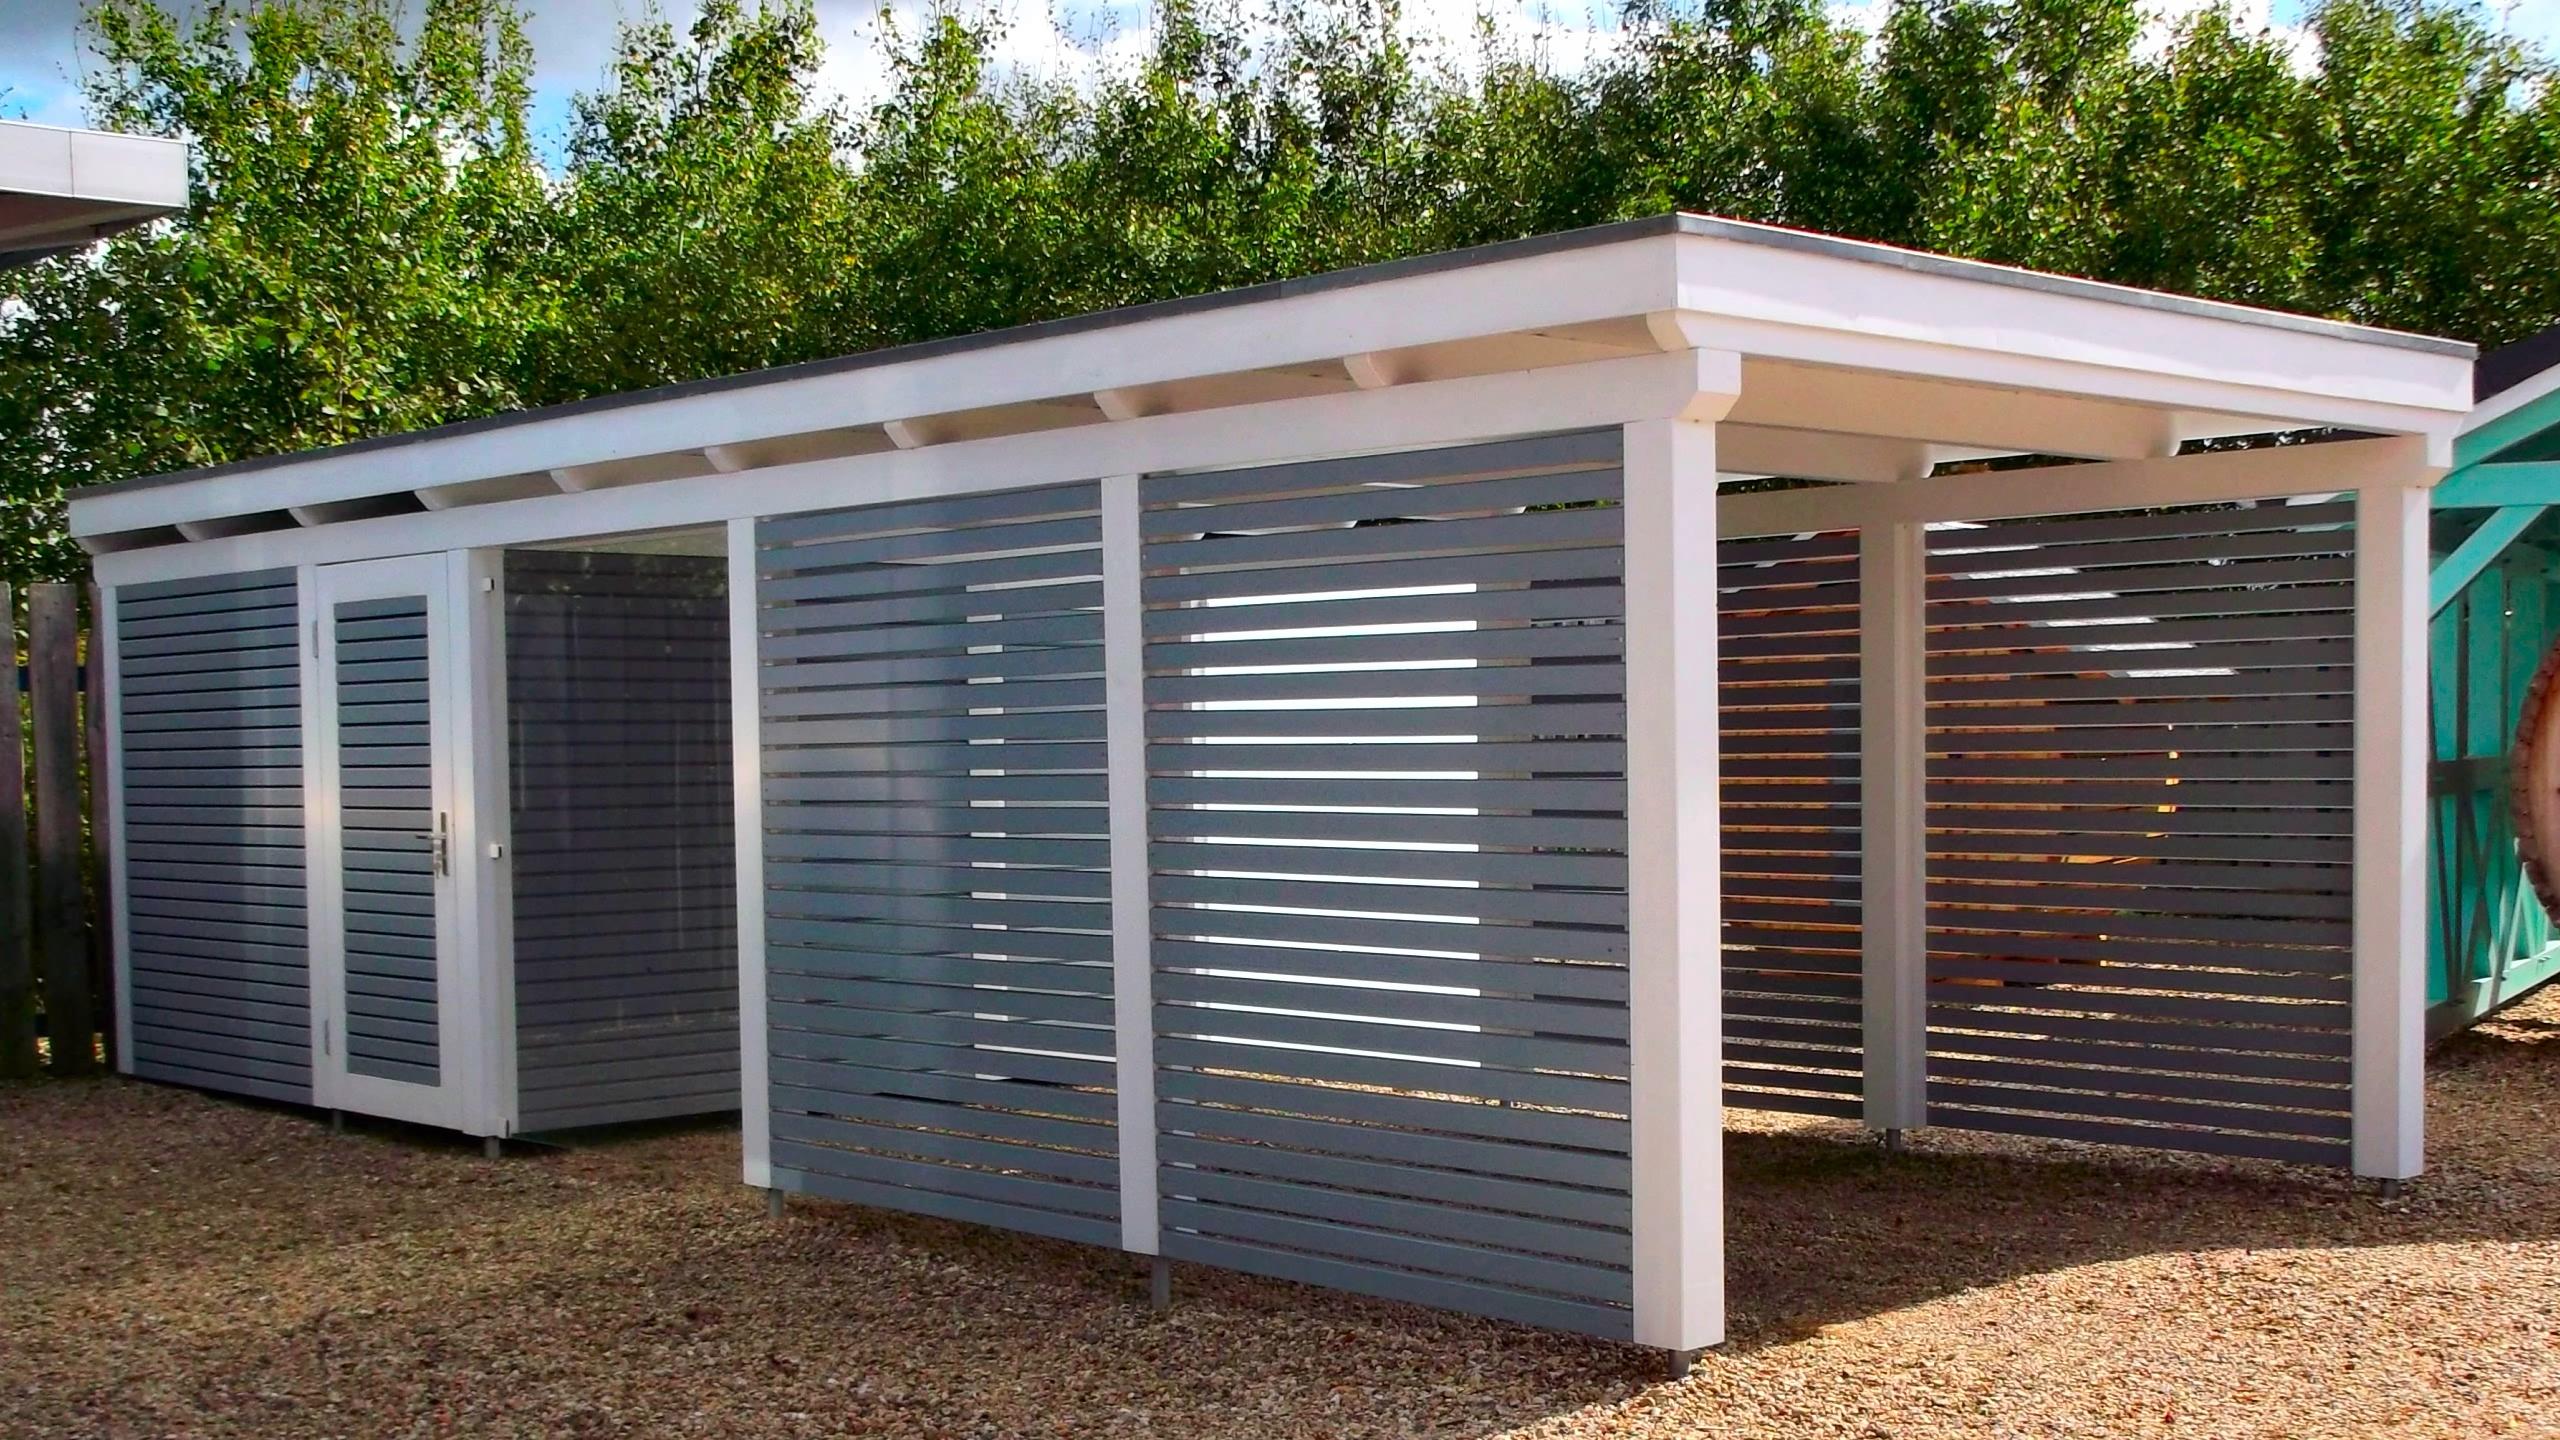 solarcarport ab 0 aus holz alu oder stahl 30 jahre garantie. Black Bedroom Furniture Sets. Home Design Ideas